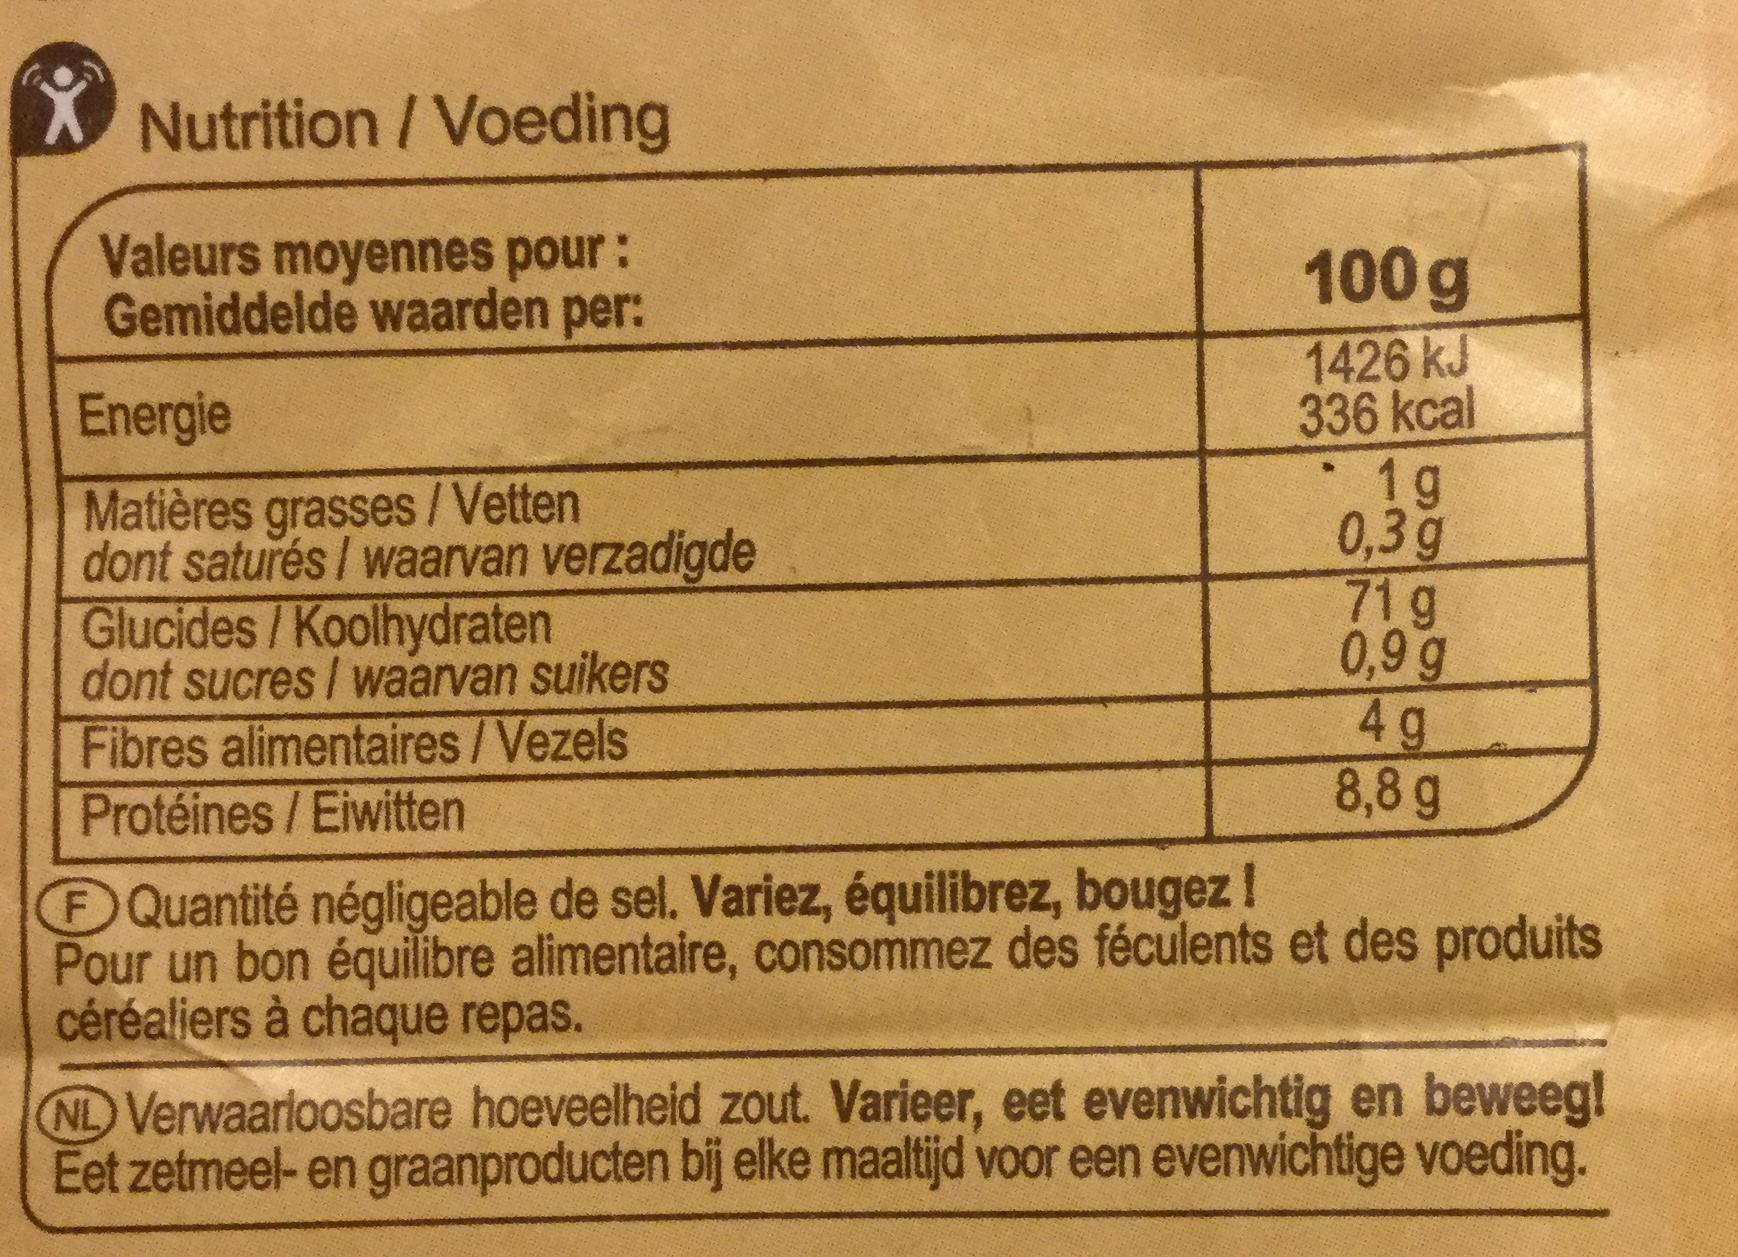 Farine de ble - Voedingswaarden - fr